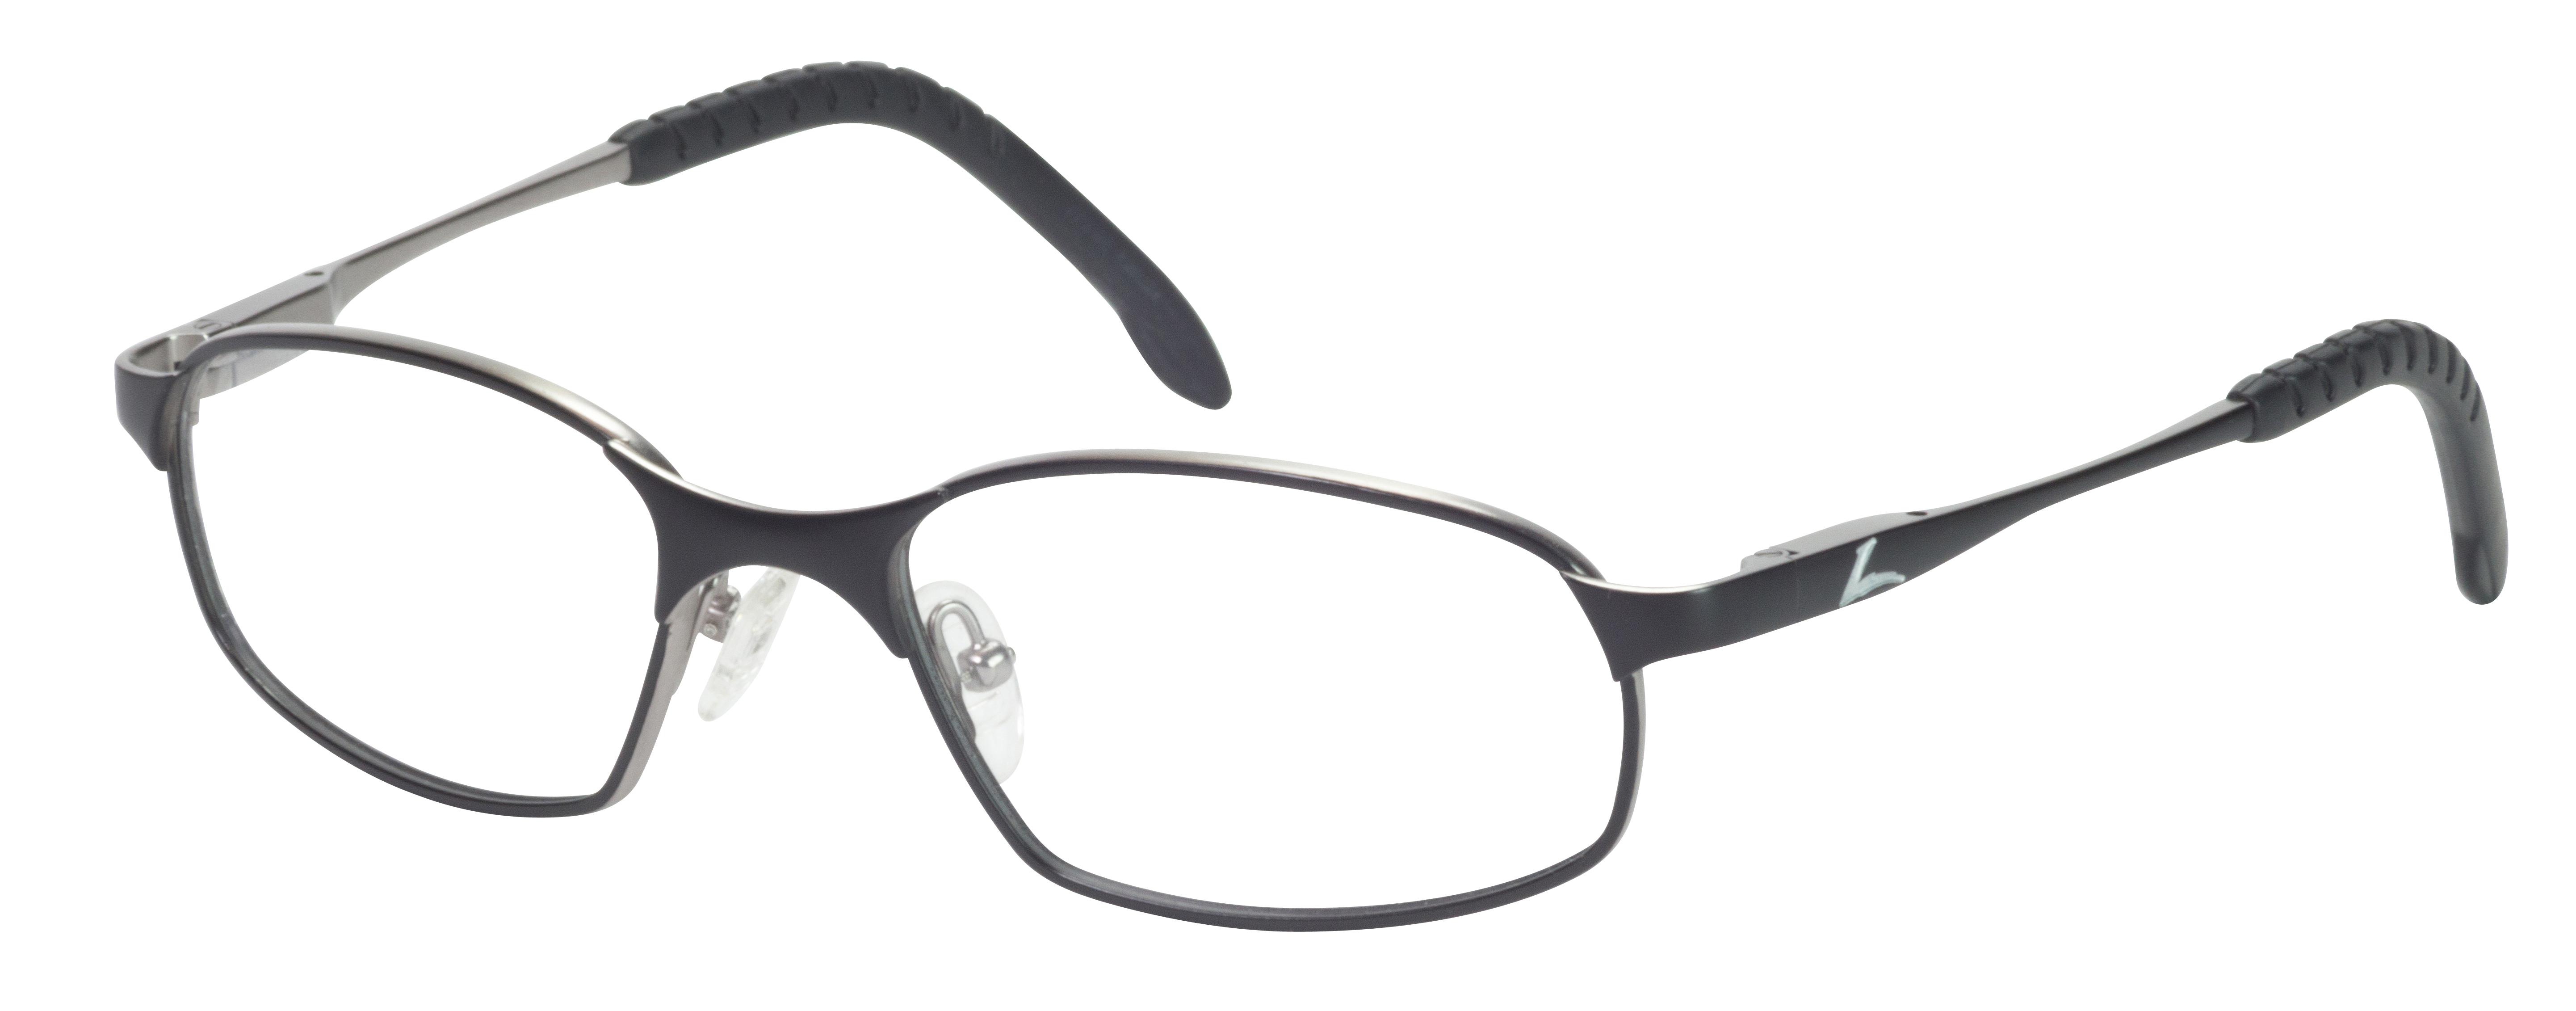 Safety Eyewear – Safety Glasses Network